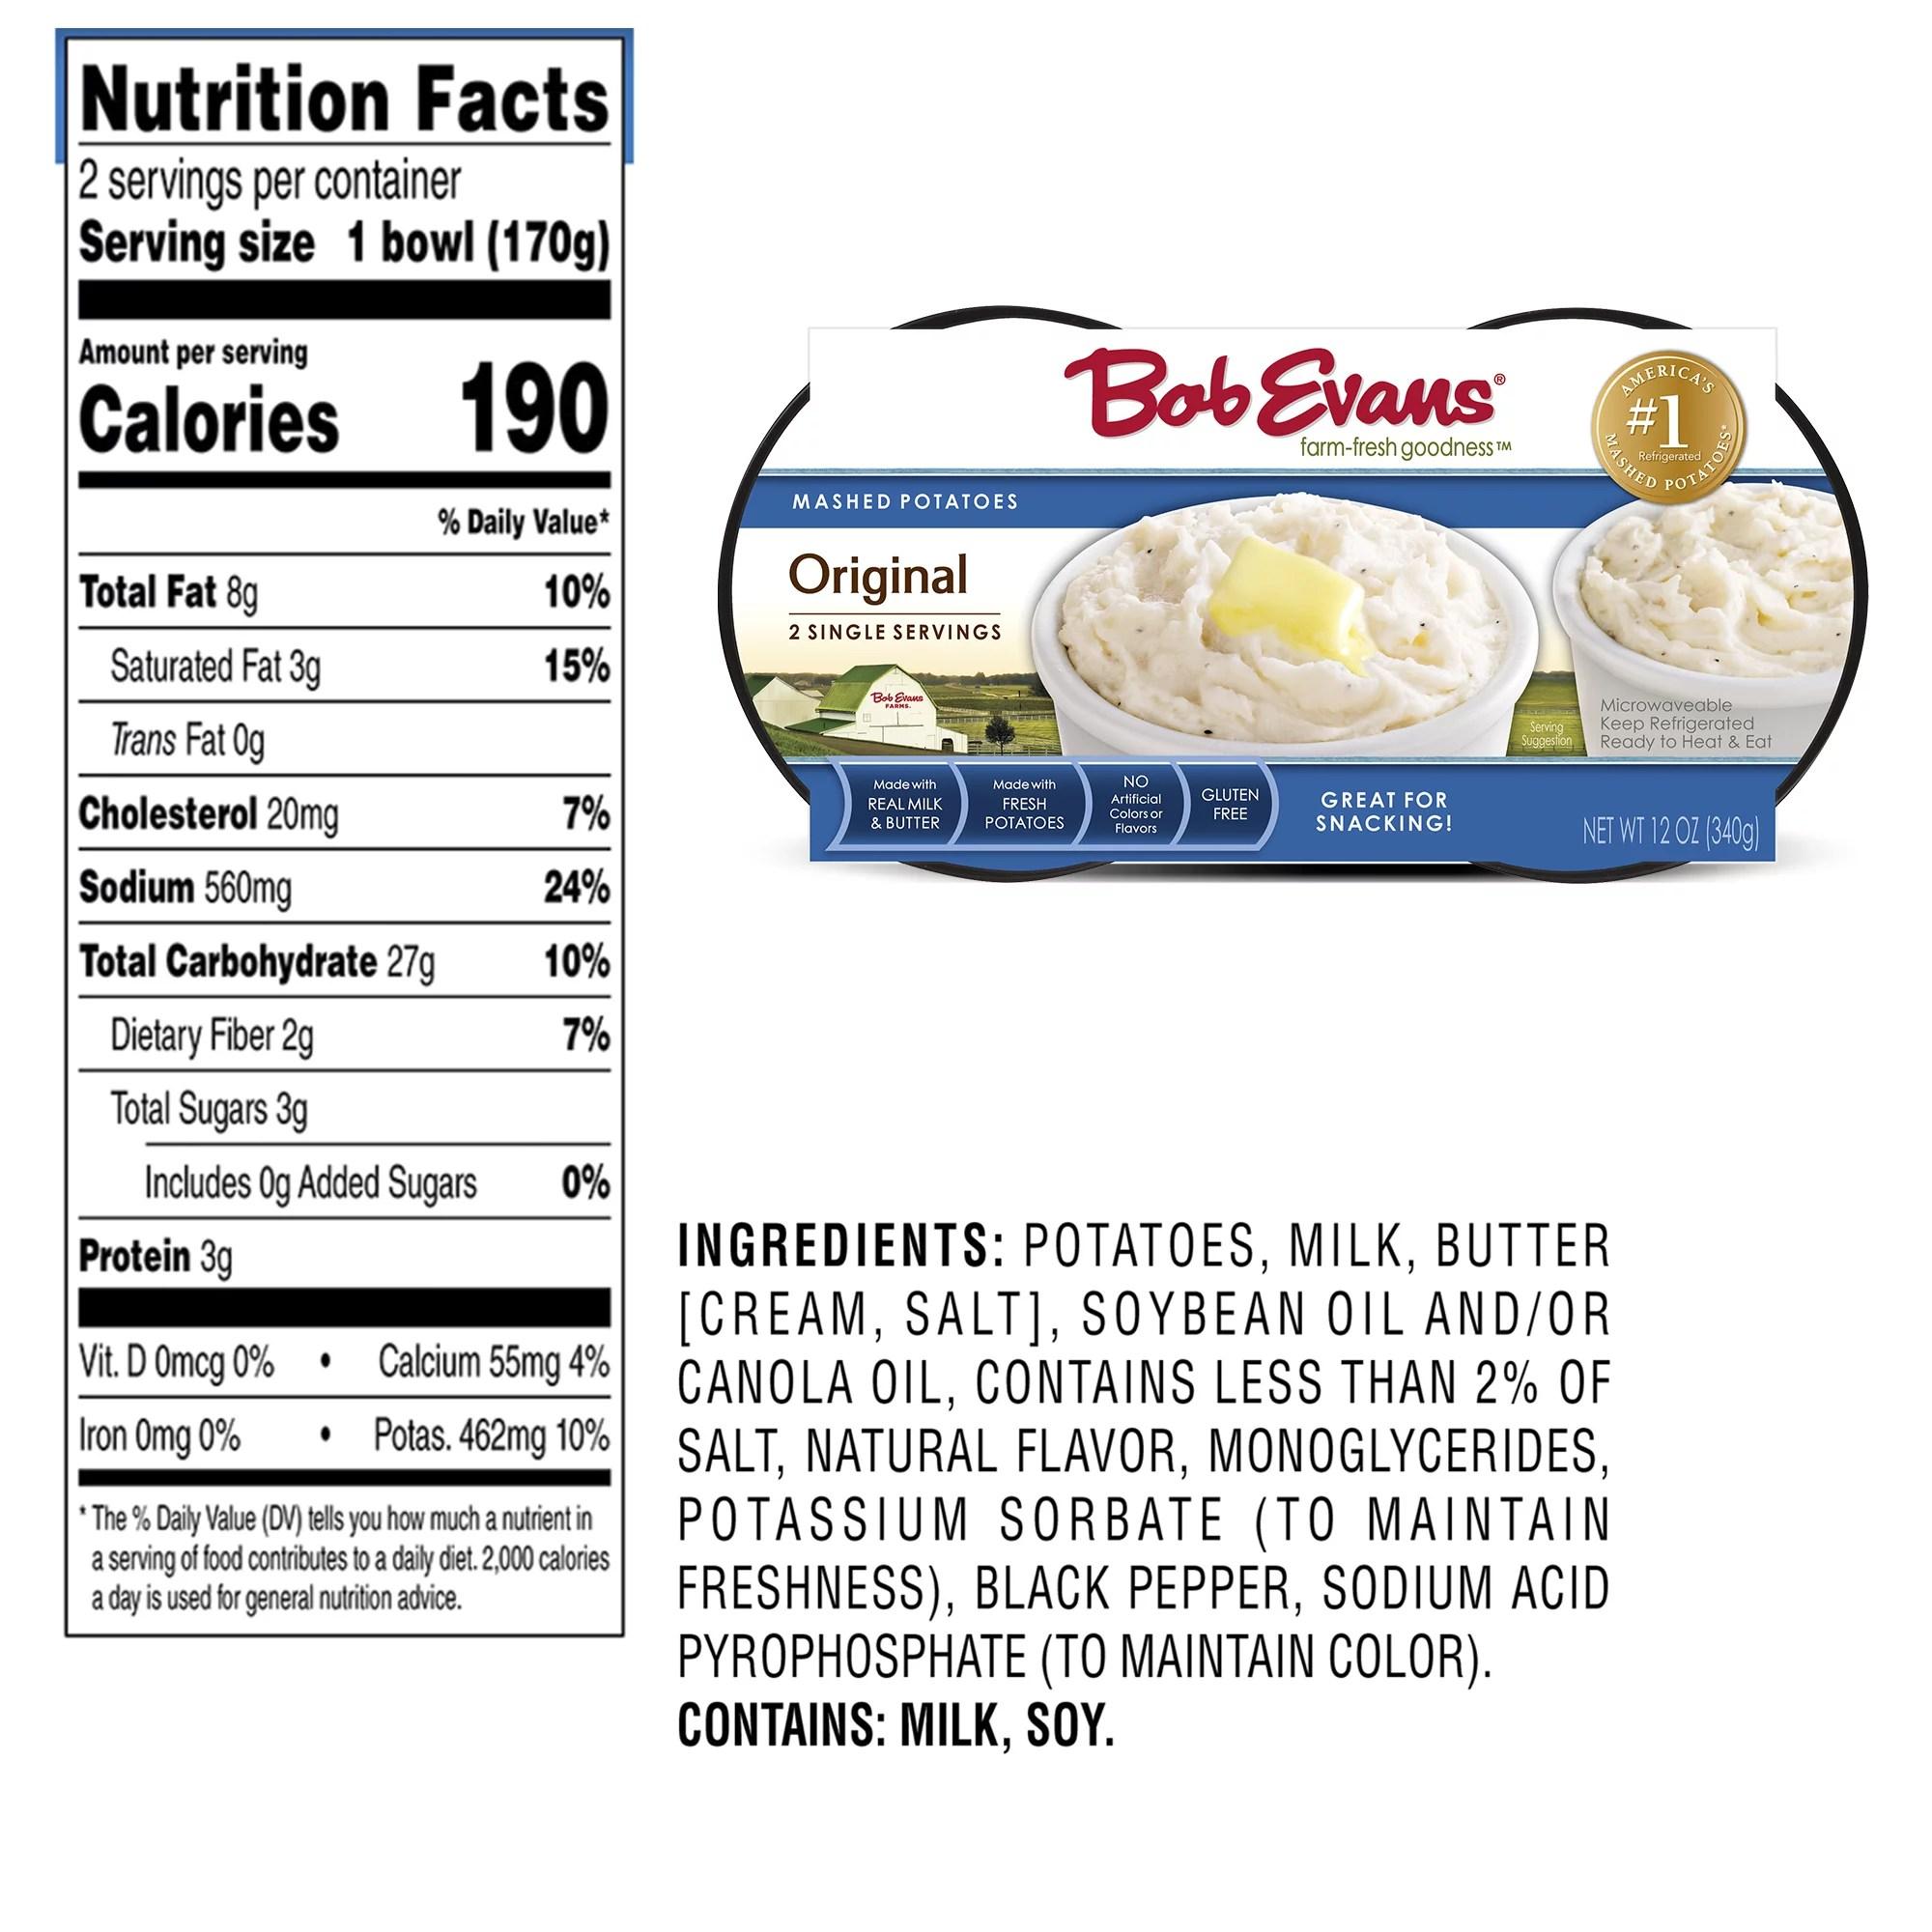 bob evans original mashed potatoes single serving twin cups 12 oz pack of 1